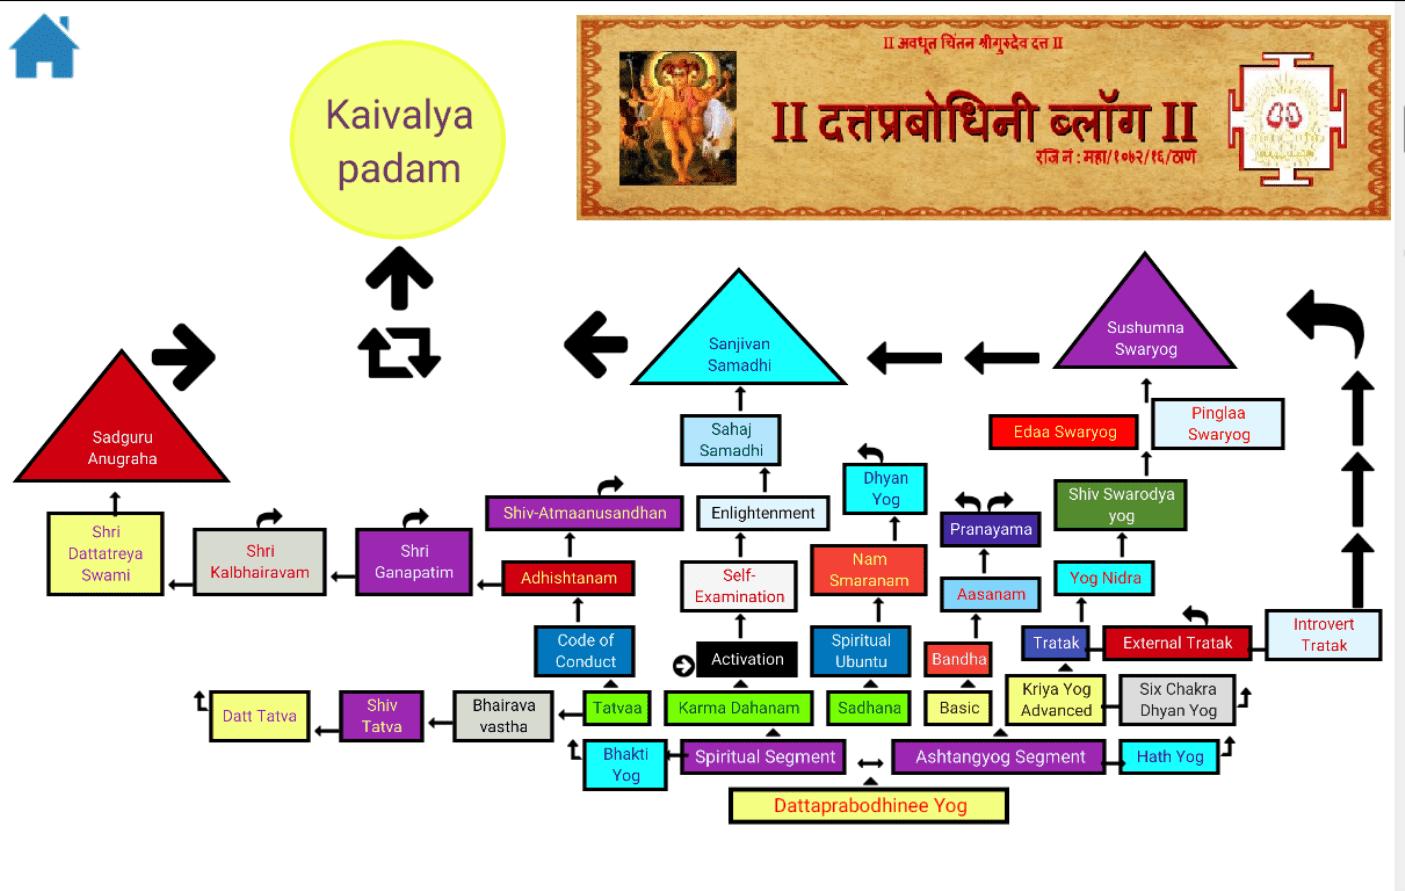 Swami Samarth : Yog, Dhyan, Secrets, Naam, Non-Dual, Upasana